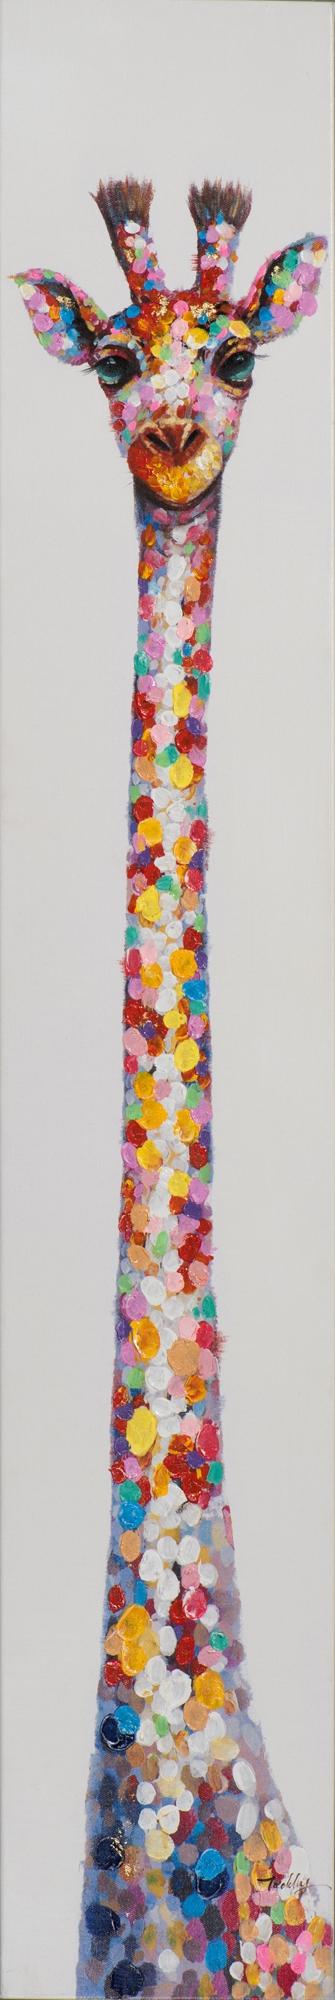 schilderij giraf 25x150